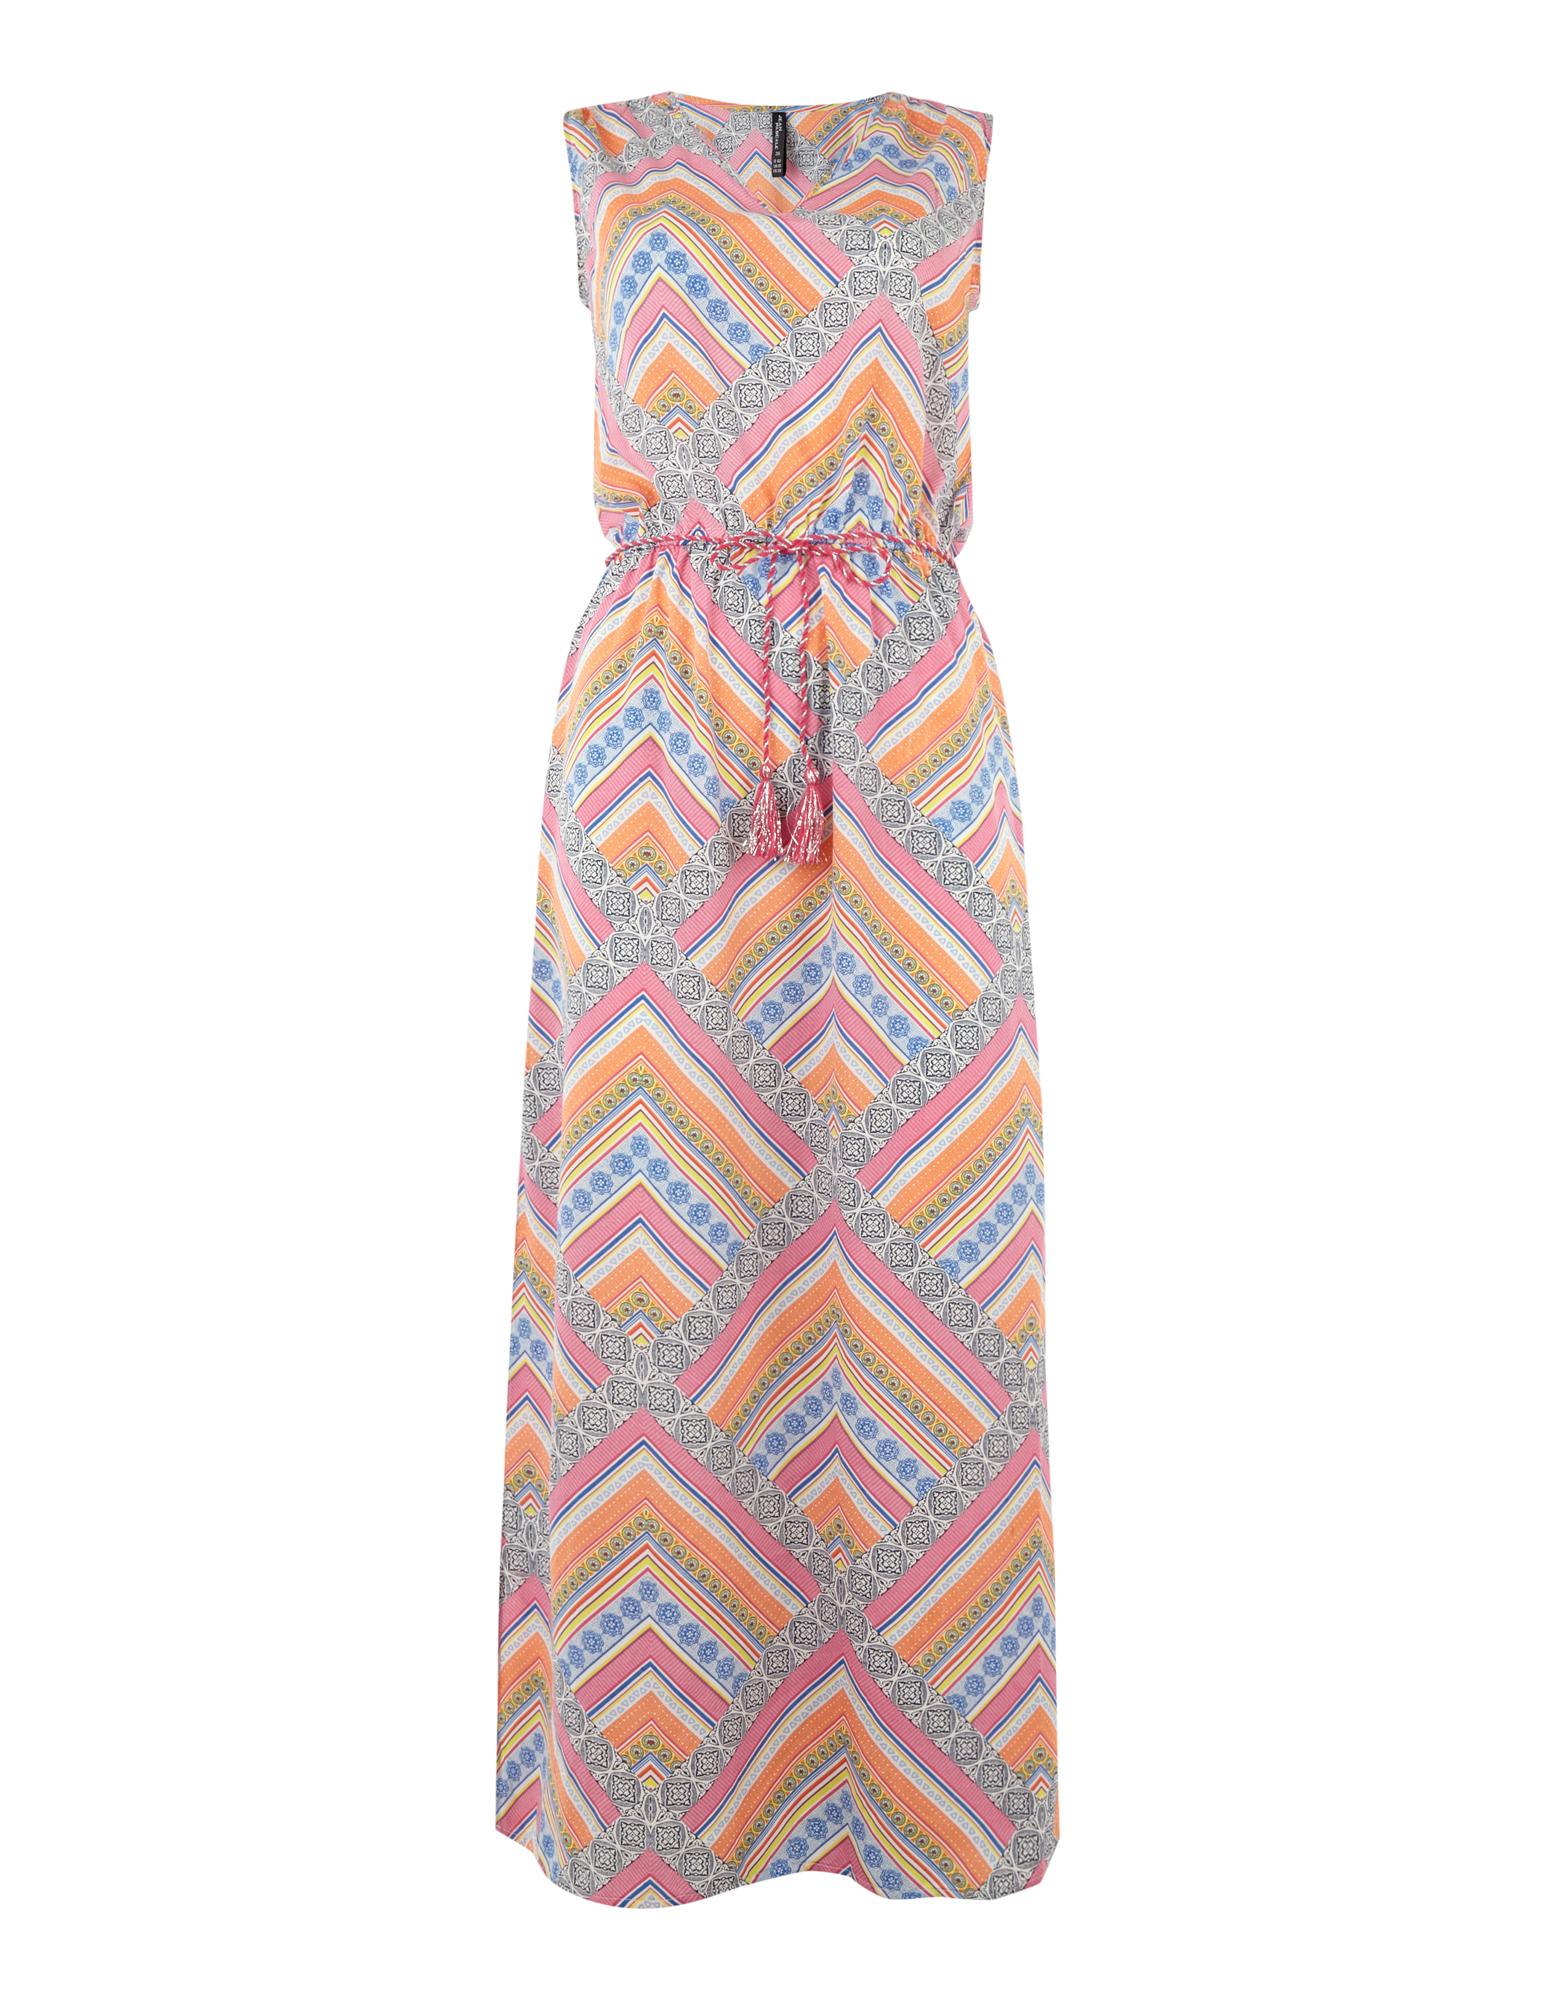 Damen Maxikleid mit Mustermix bunt,mehrfarbig | 81452019800303